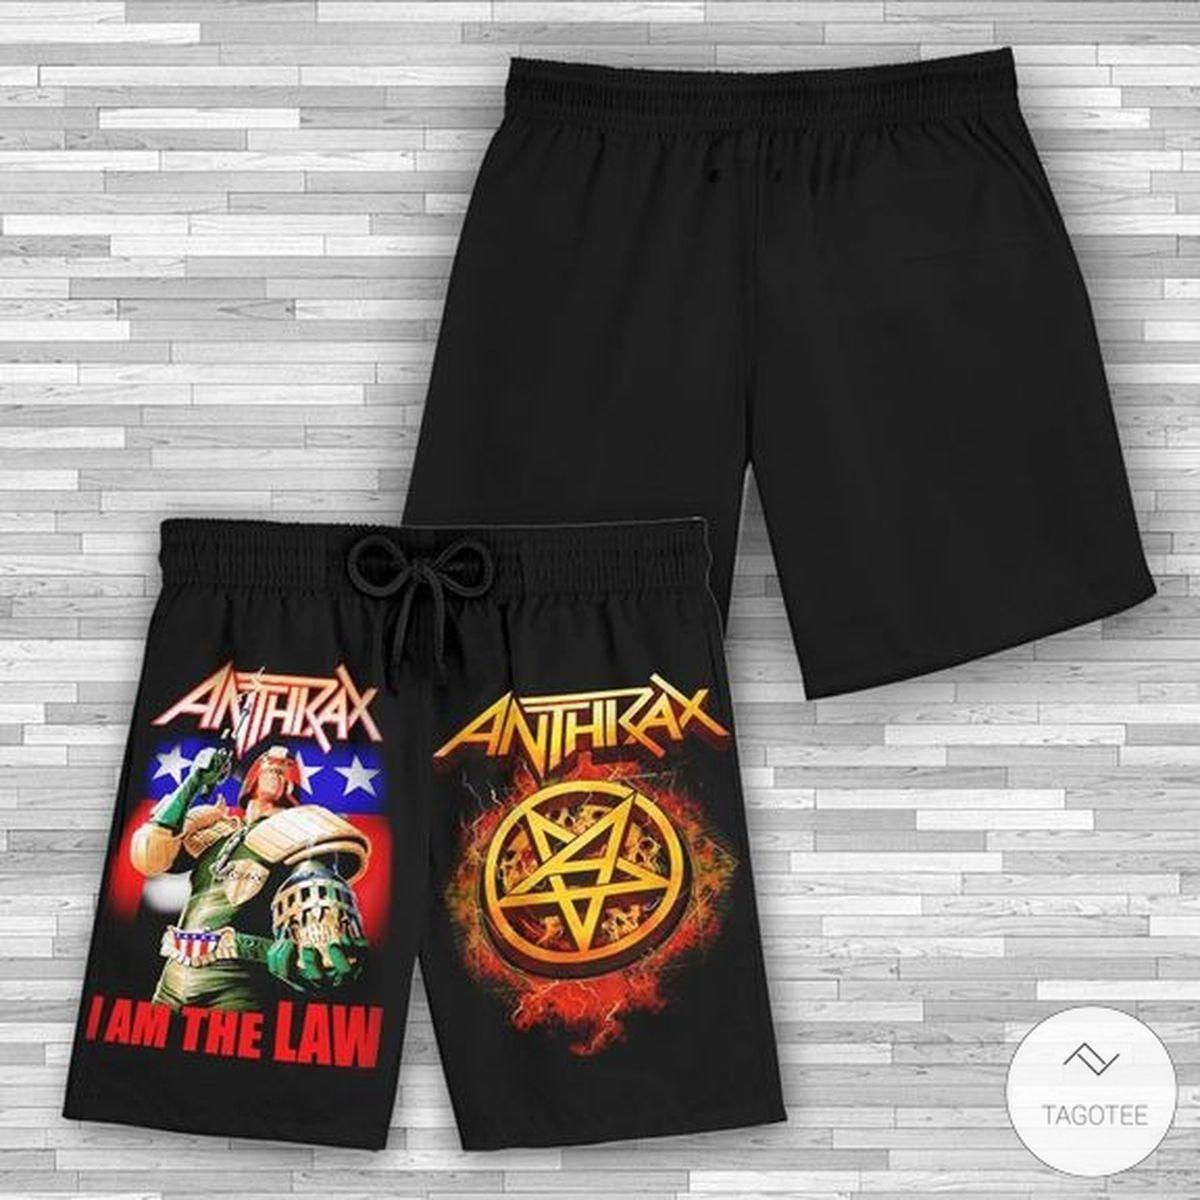 Anthrax Short